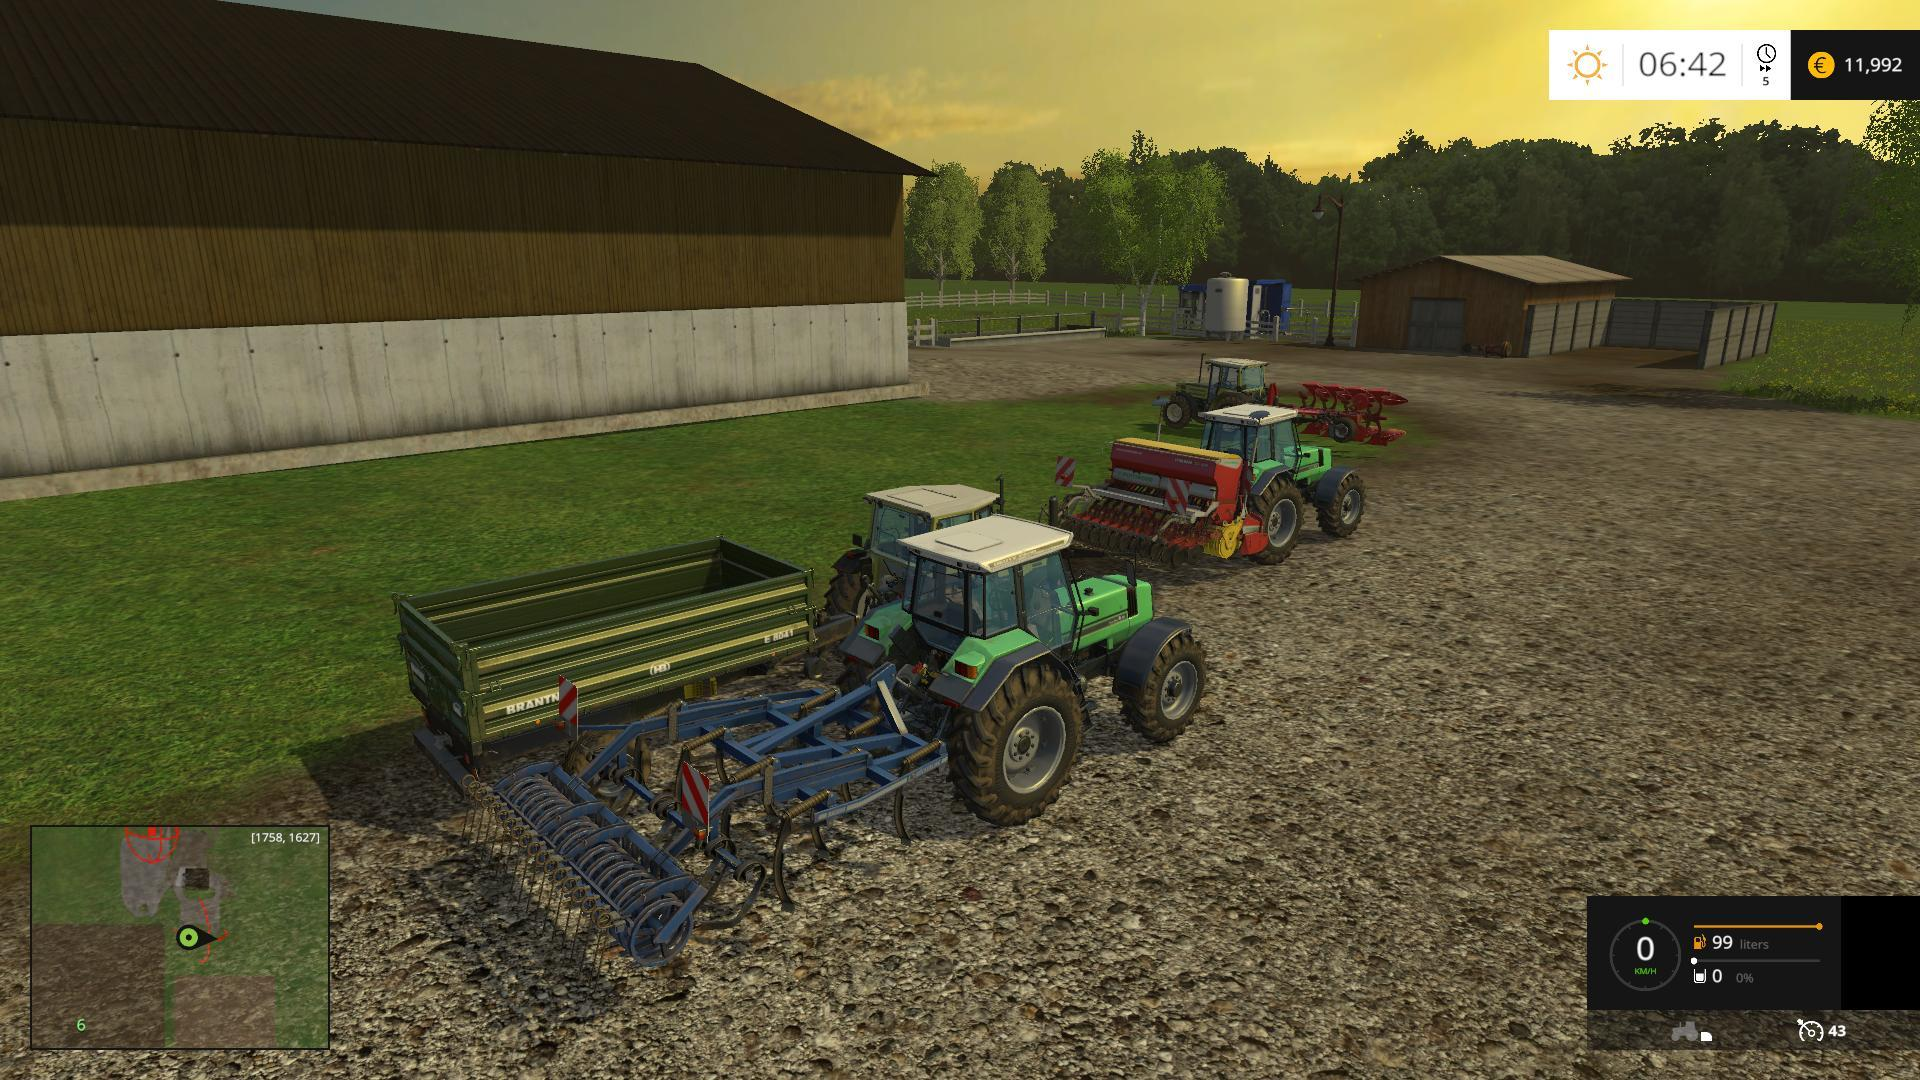 The best way to make money in farming simulator 2013 indir